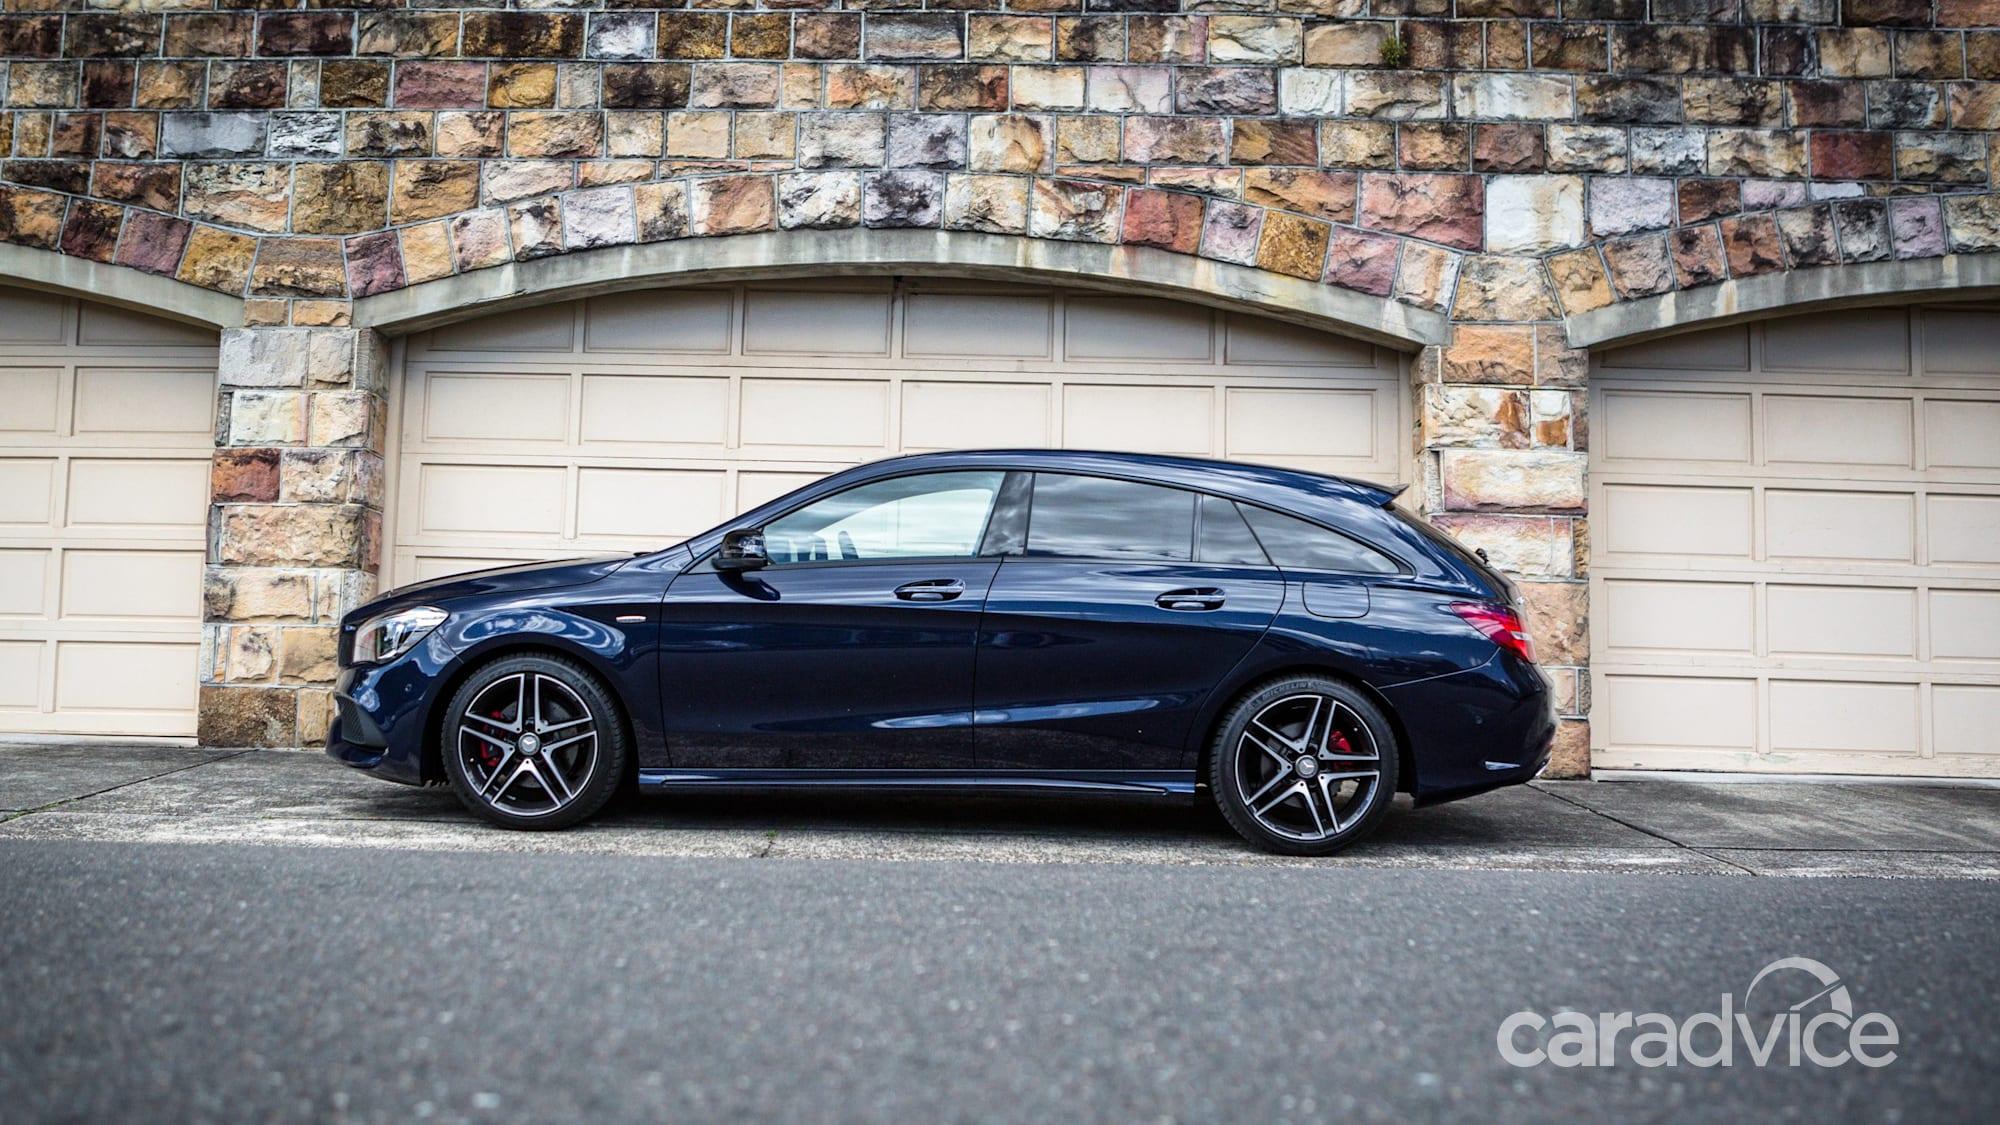 2016 Mercedes-Benz CLA 250 Sport 4Matic Shooting Brake review | CarAdvice